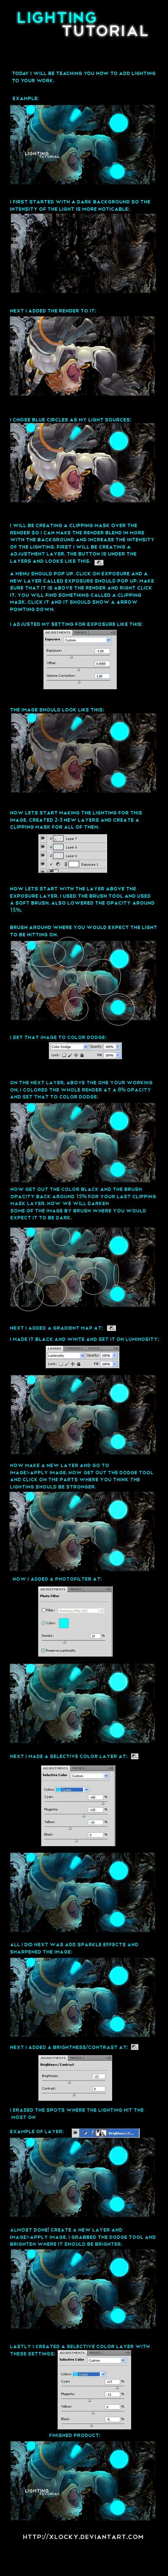 My Tutorials Lighting_tutorial_by_xlocky-d5g7l1p